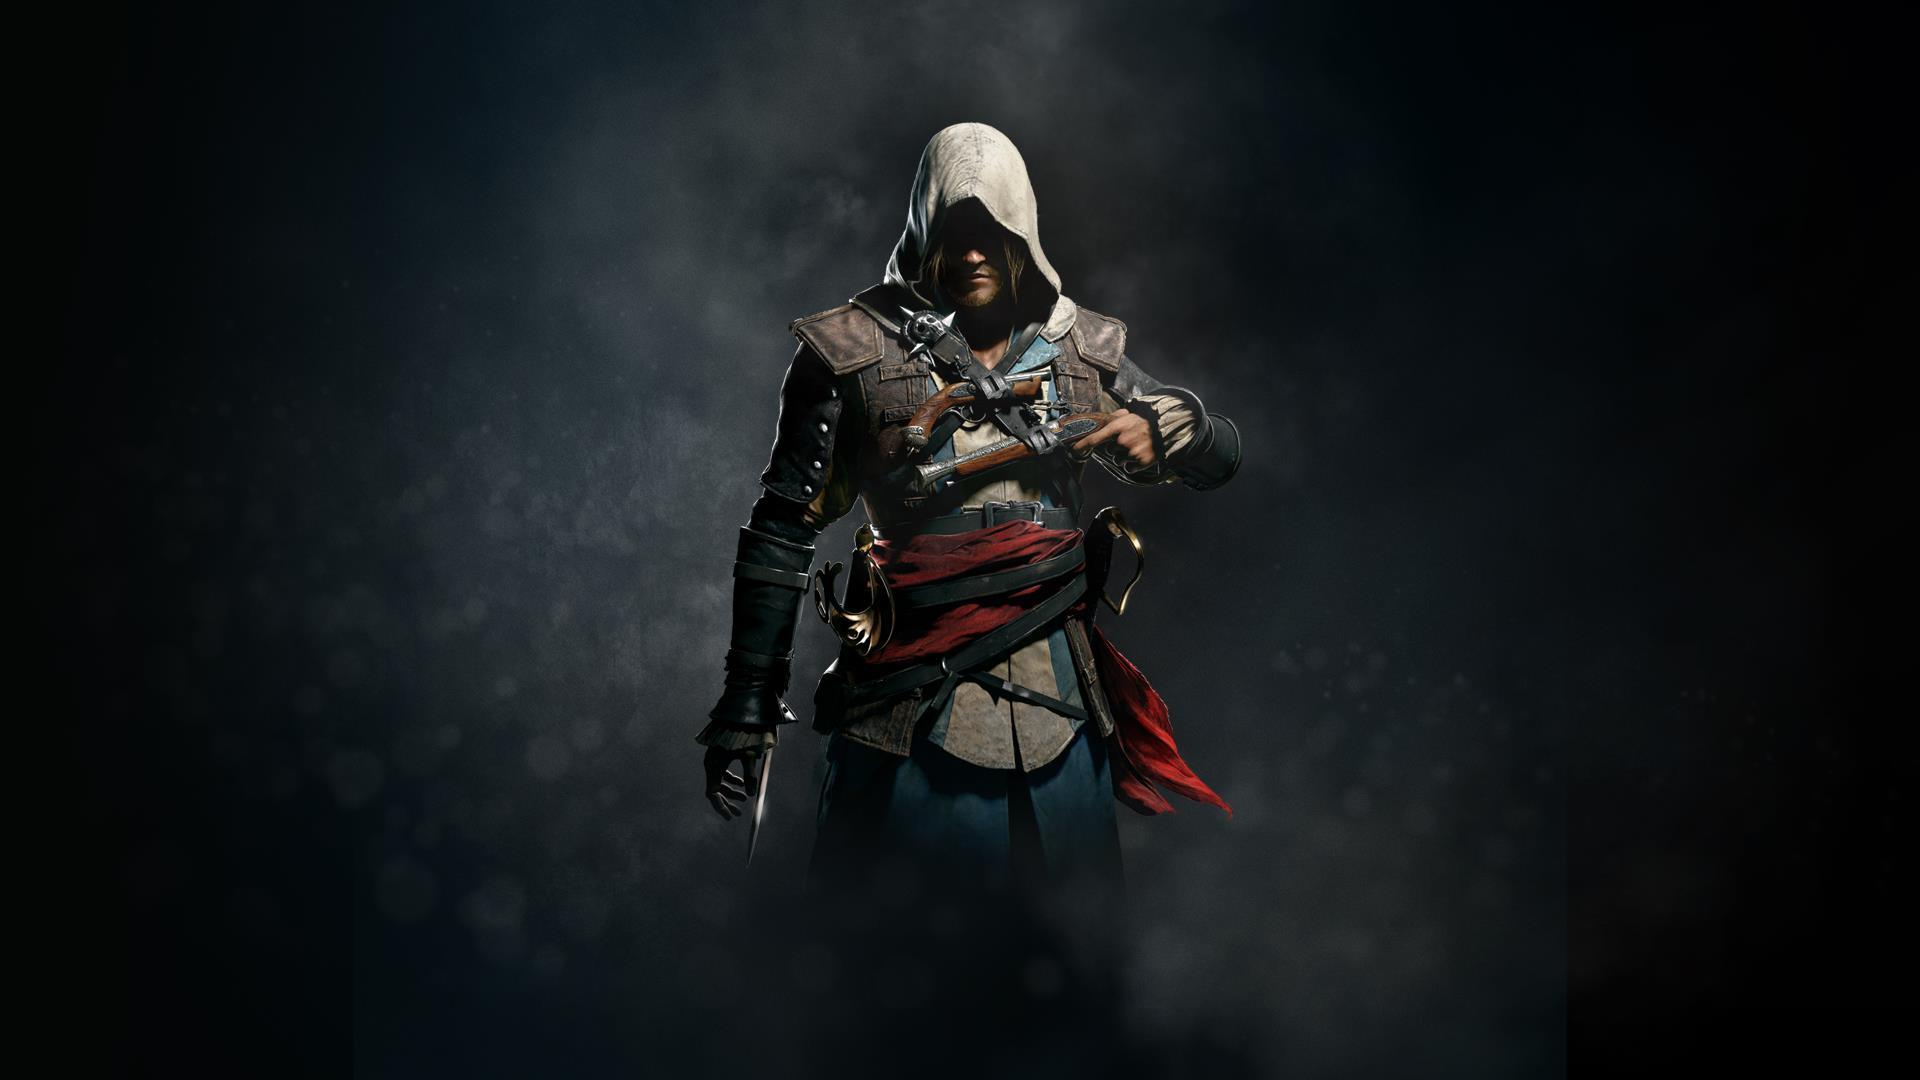 Sea Legs in Assassin's Creed IV: Black Flag